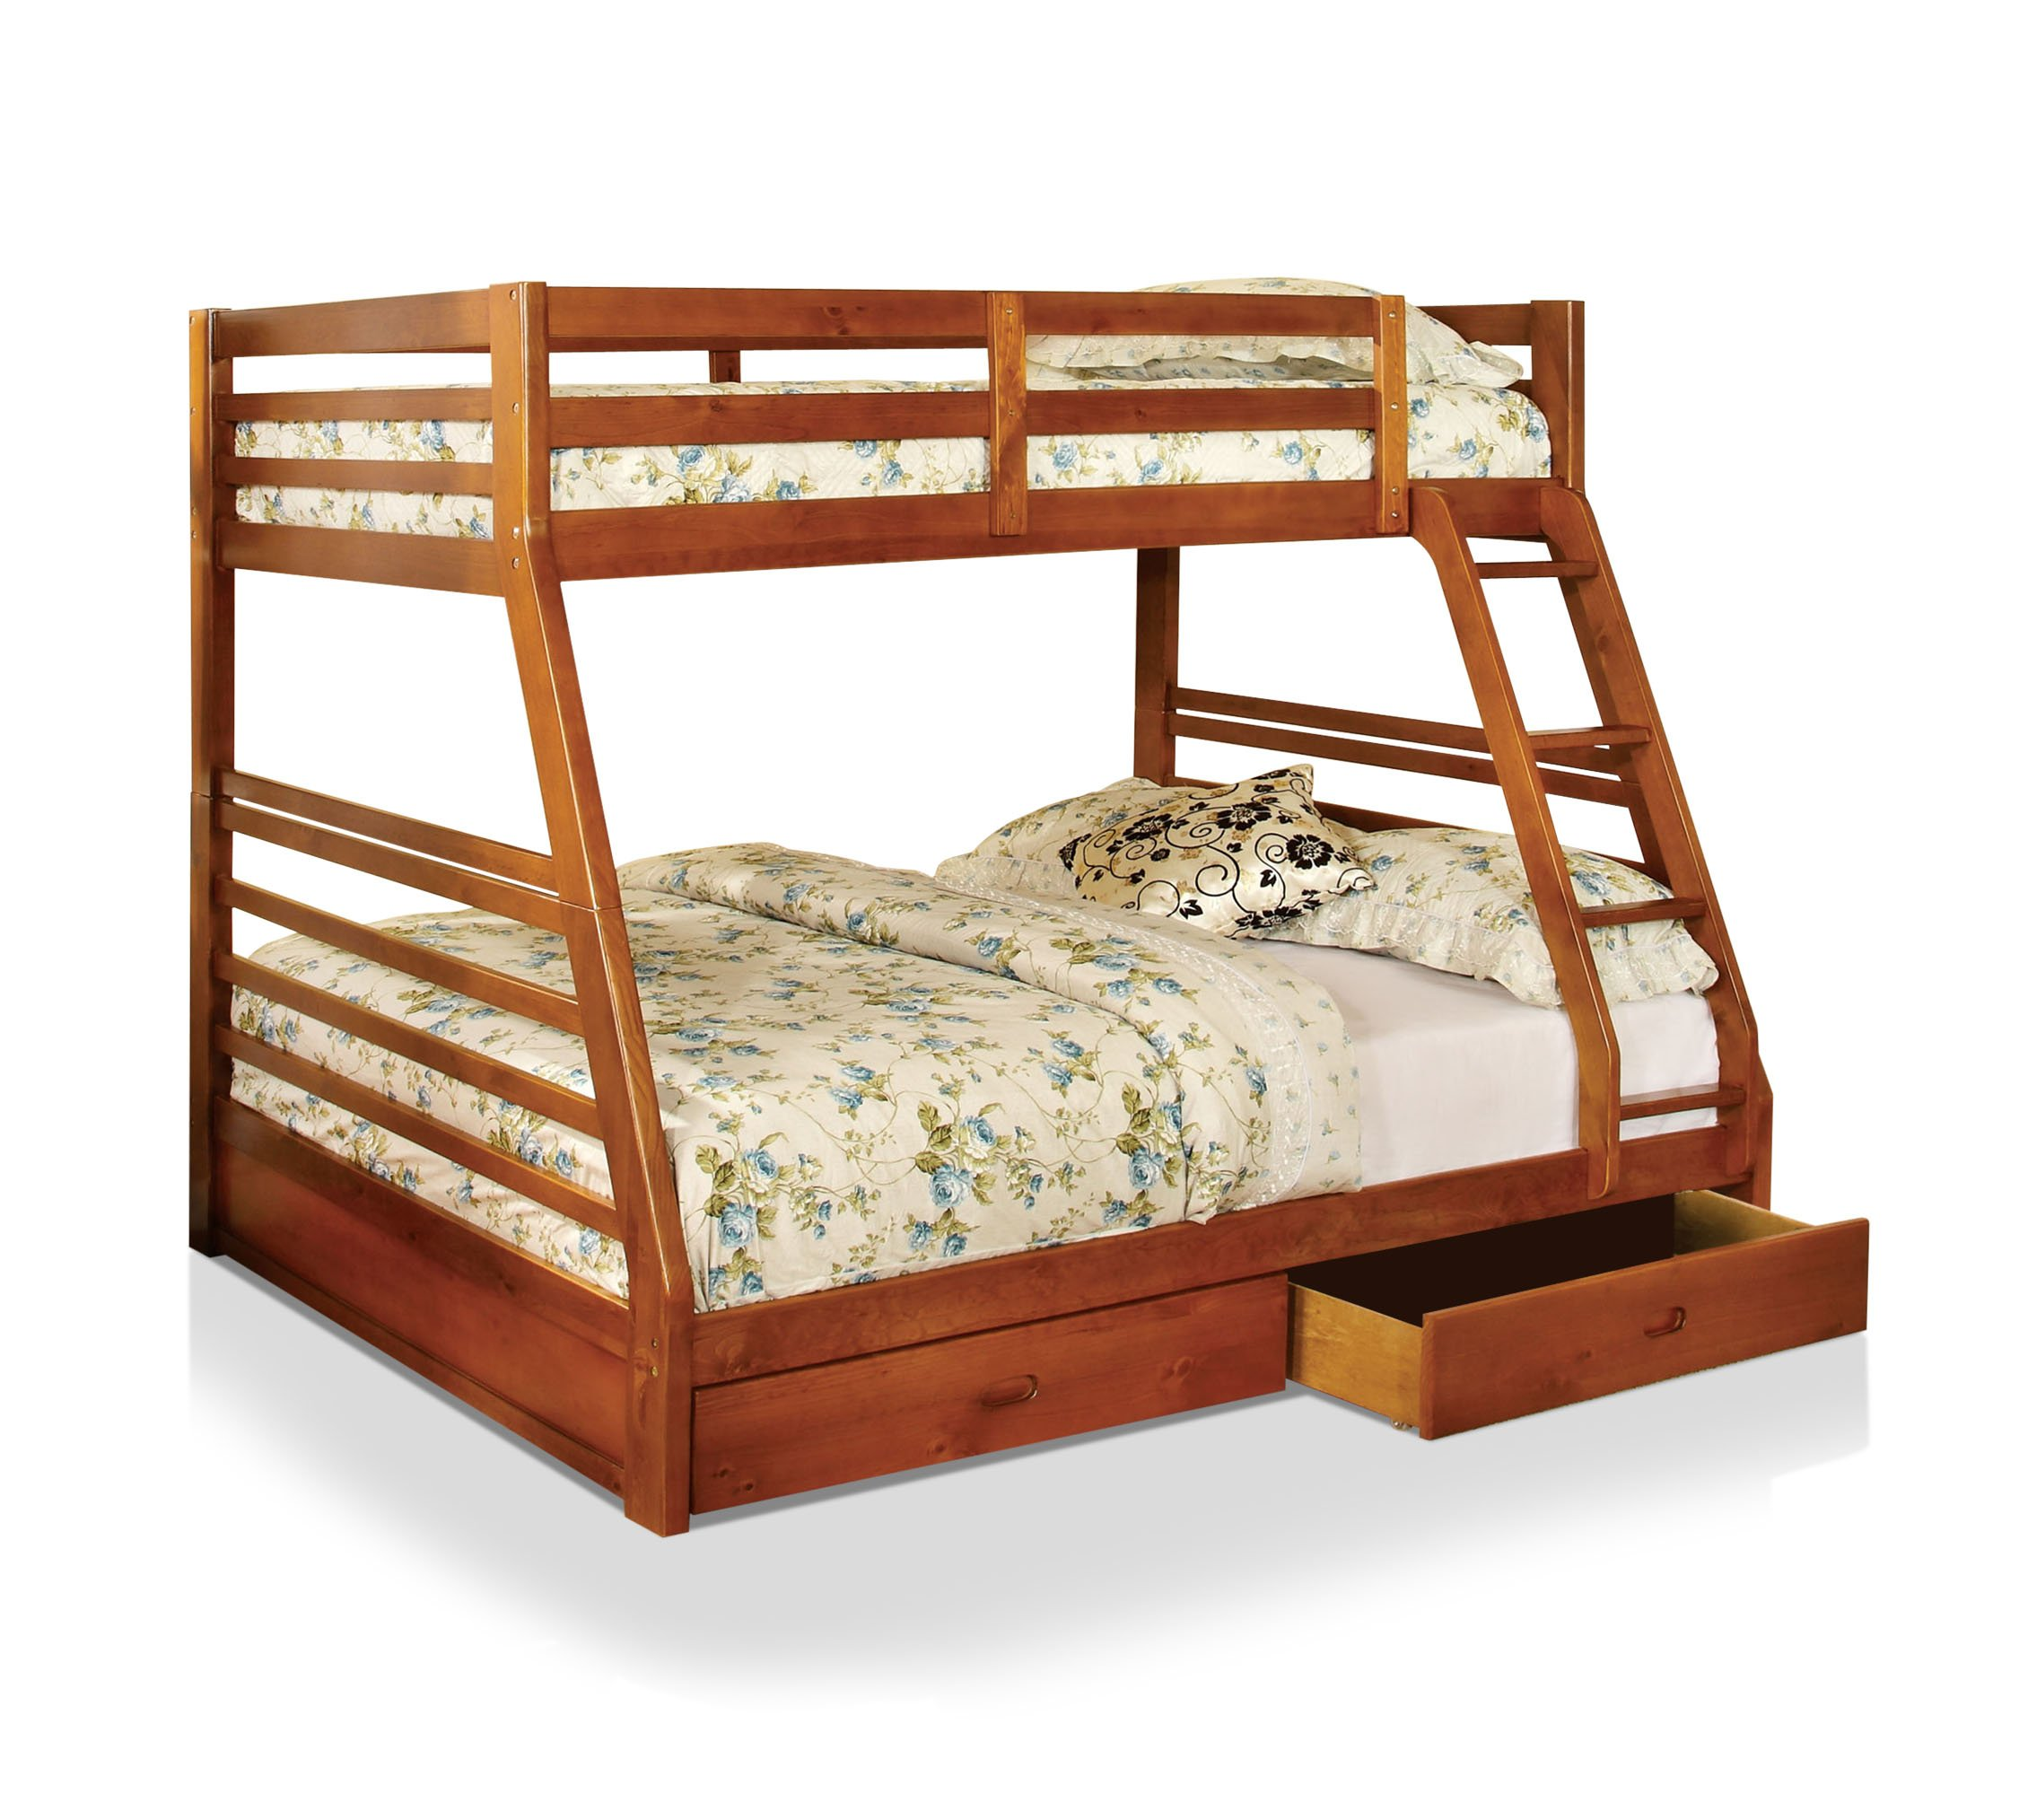 HOMES: Inside + Out IDF-BK588A Lamo Bunk Bed, Twin/Full, Oak